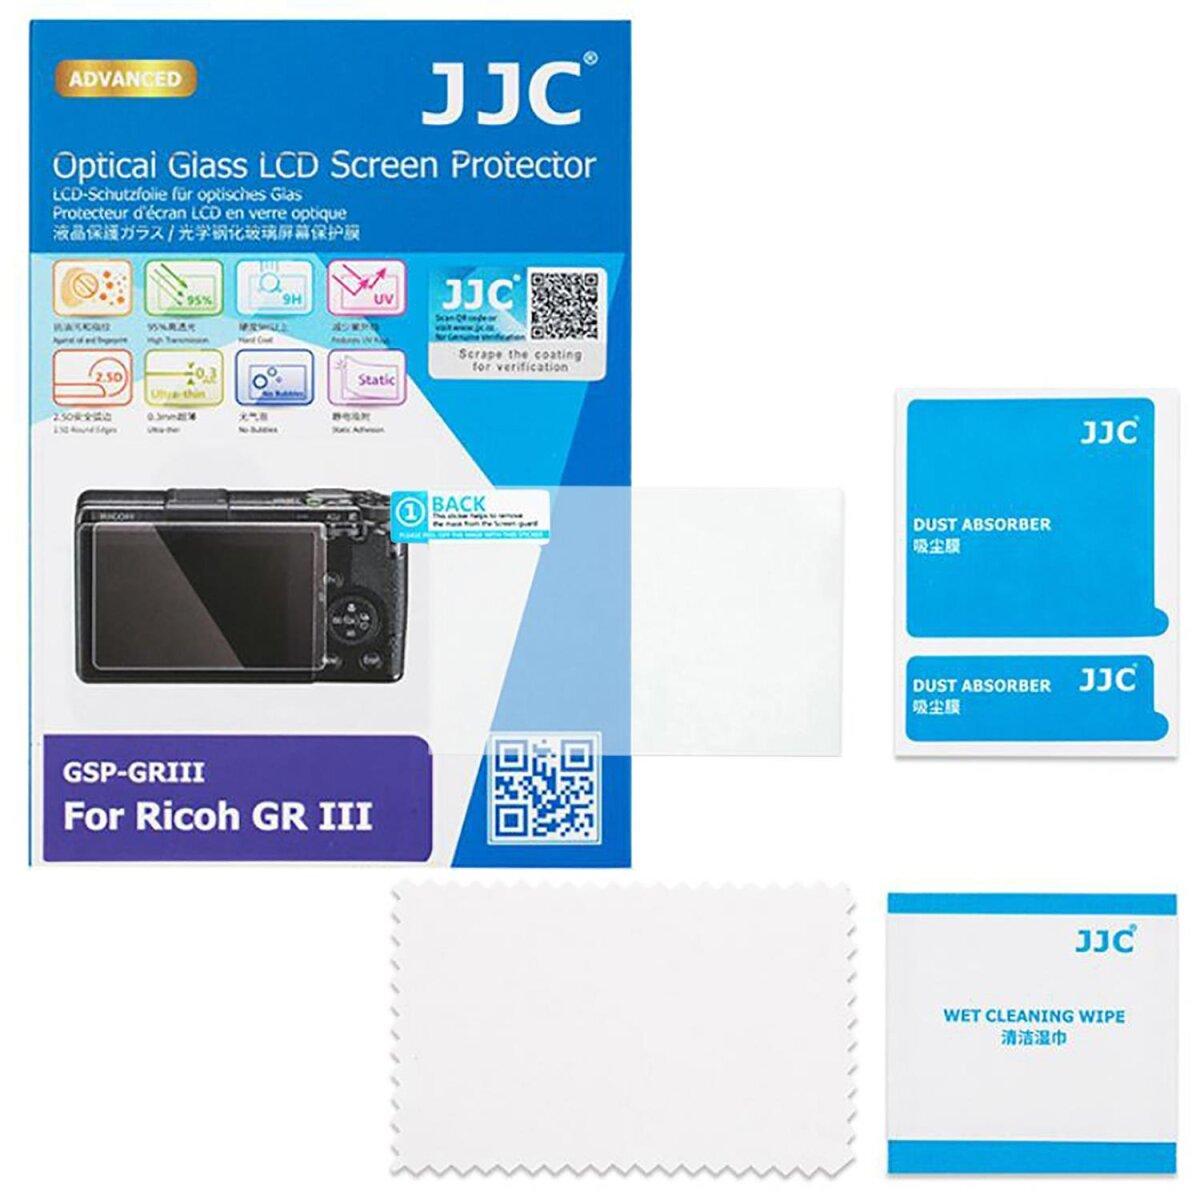 JJC Hochwertiger Displayschutz Screen Protector aus gehaertetem Echtglas, kompatibel mit Ricoh GR III